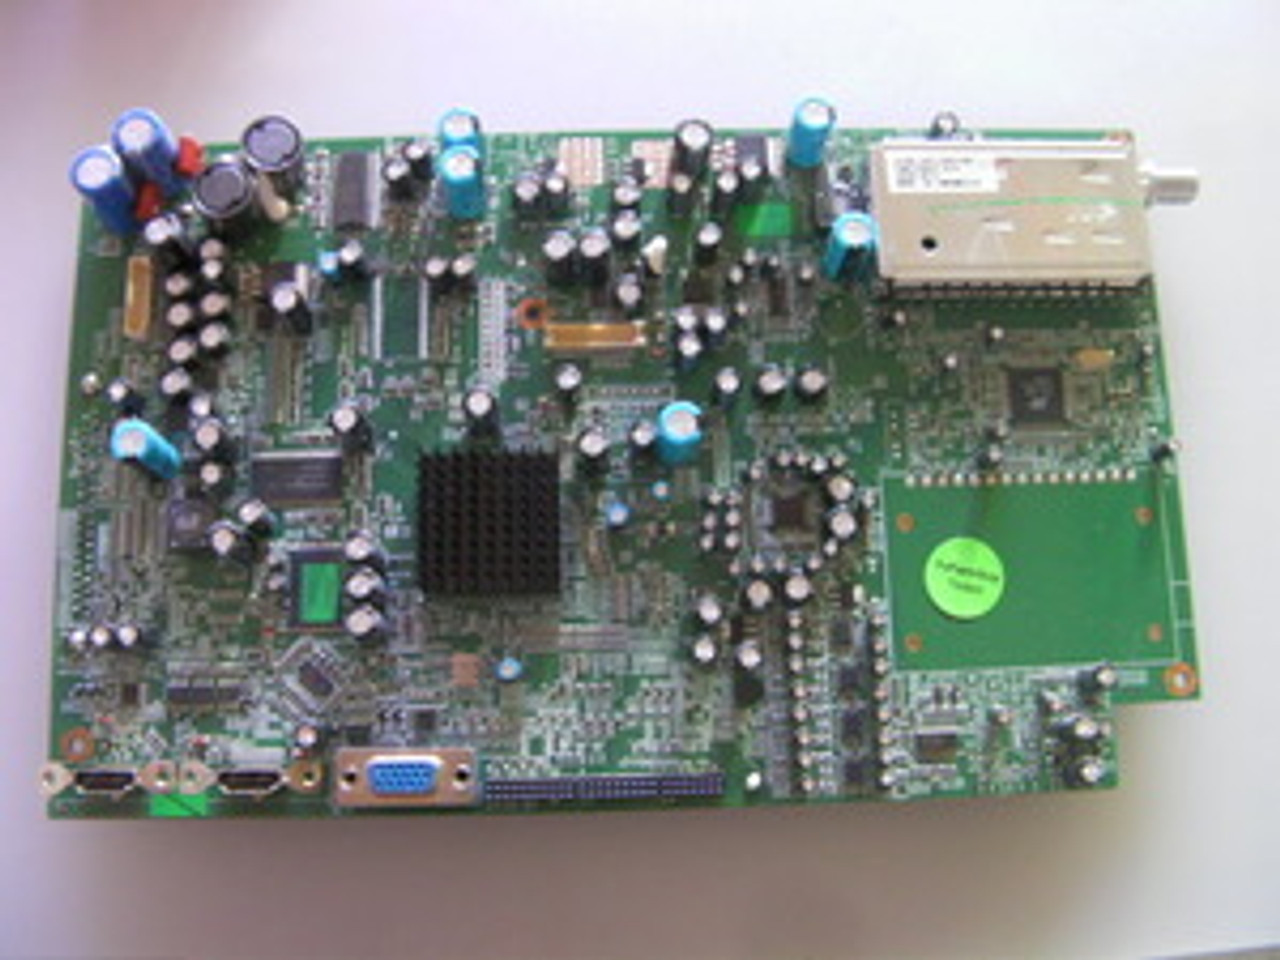 MEMOREX MLT3221 MAIN BOARD 200-107-GT321XA-BH / 899-KR2-BF3217XA2H